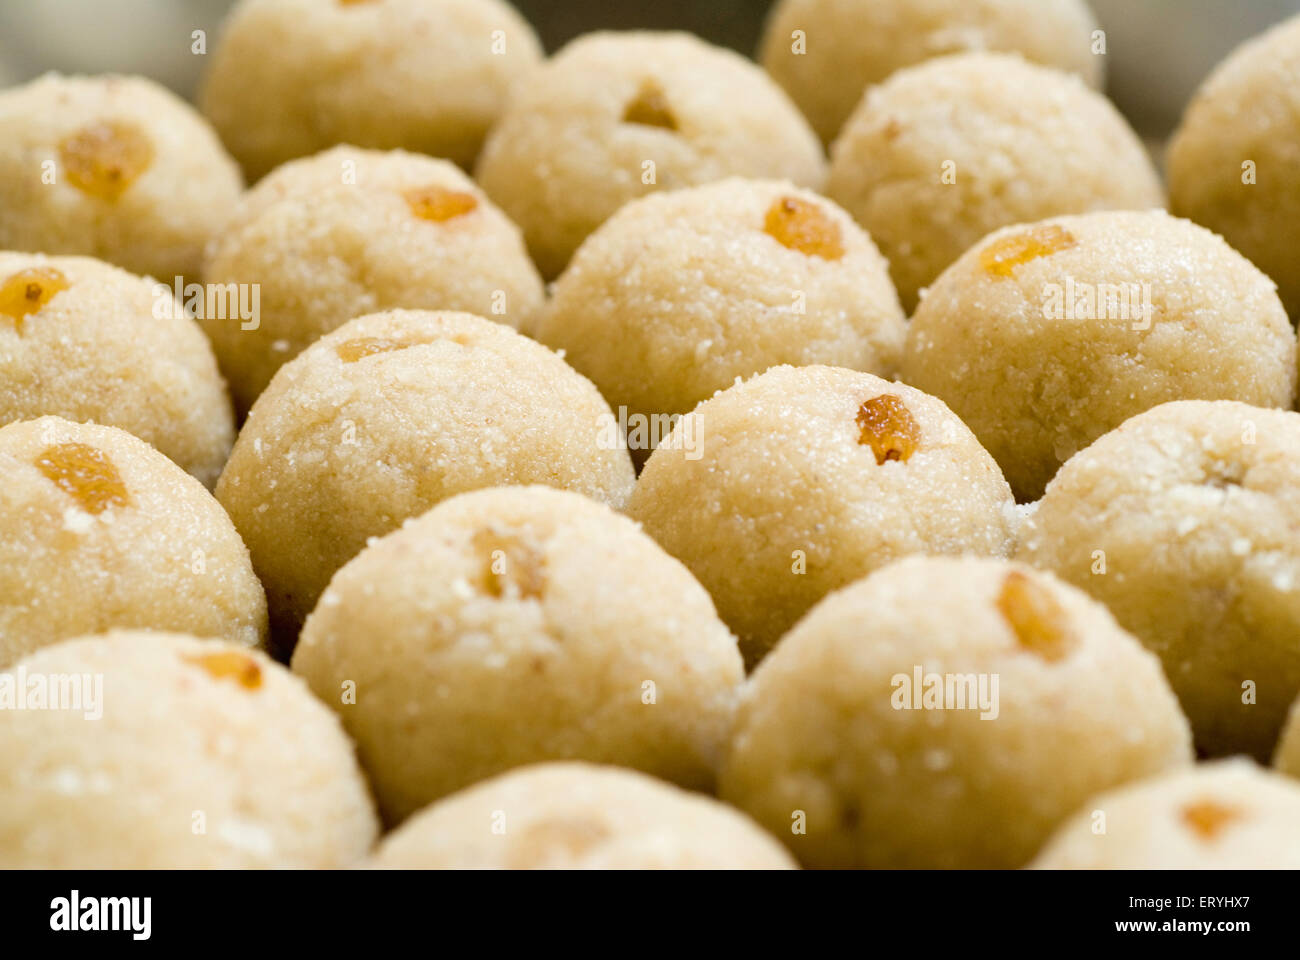 Sweetmeat ; rava semolina laddoo ladu with resins - Stock Image